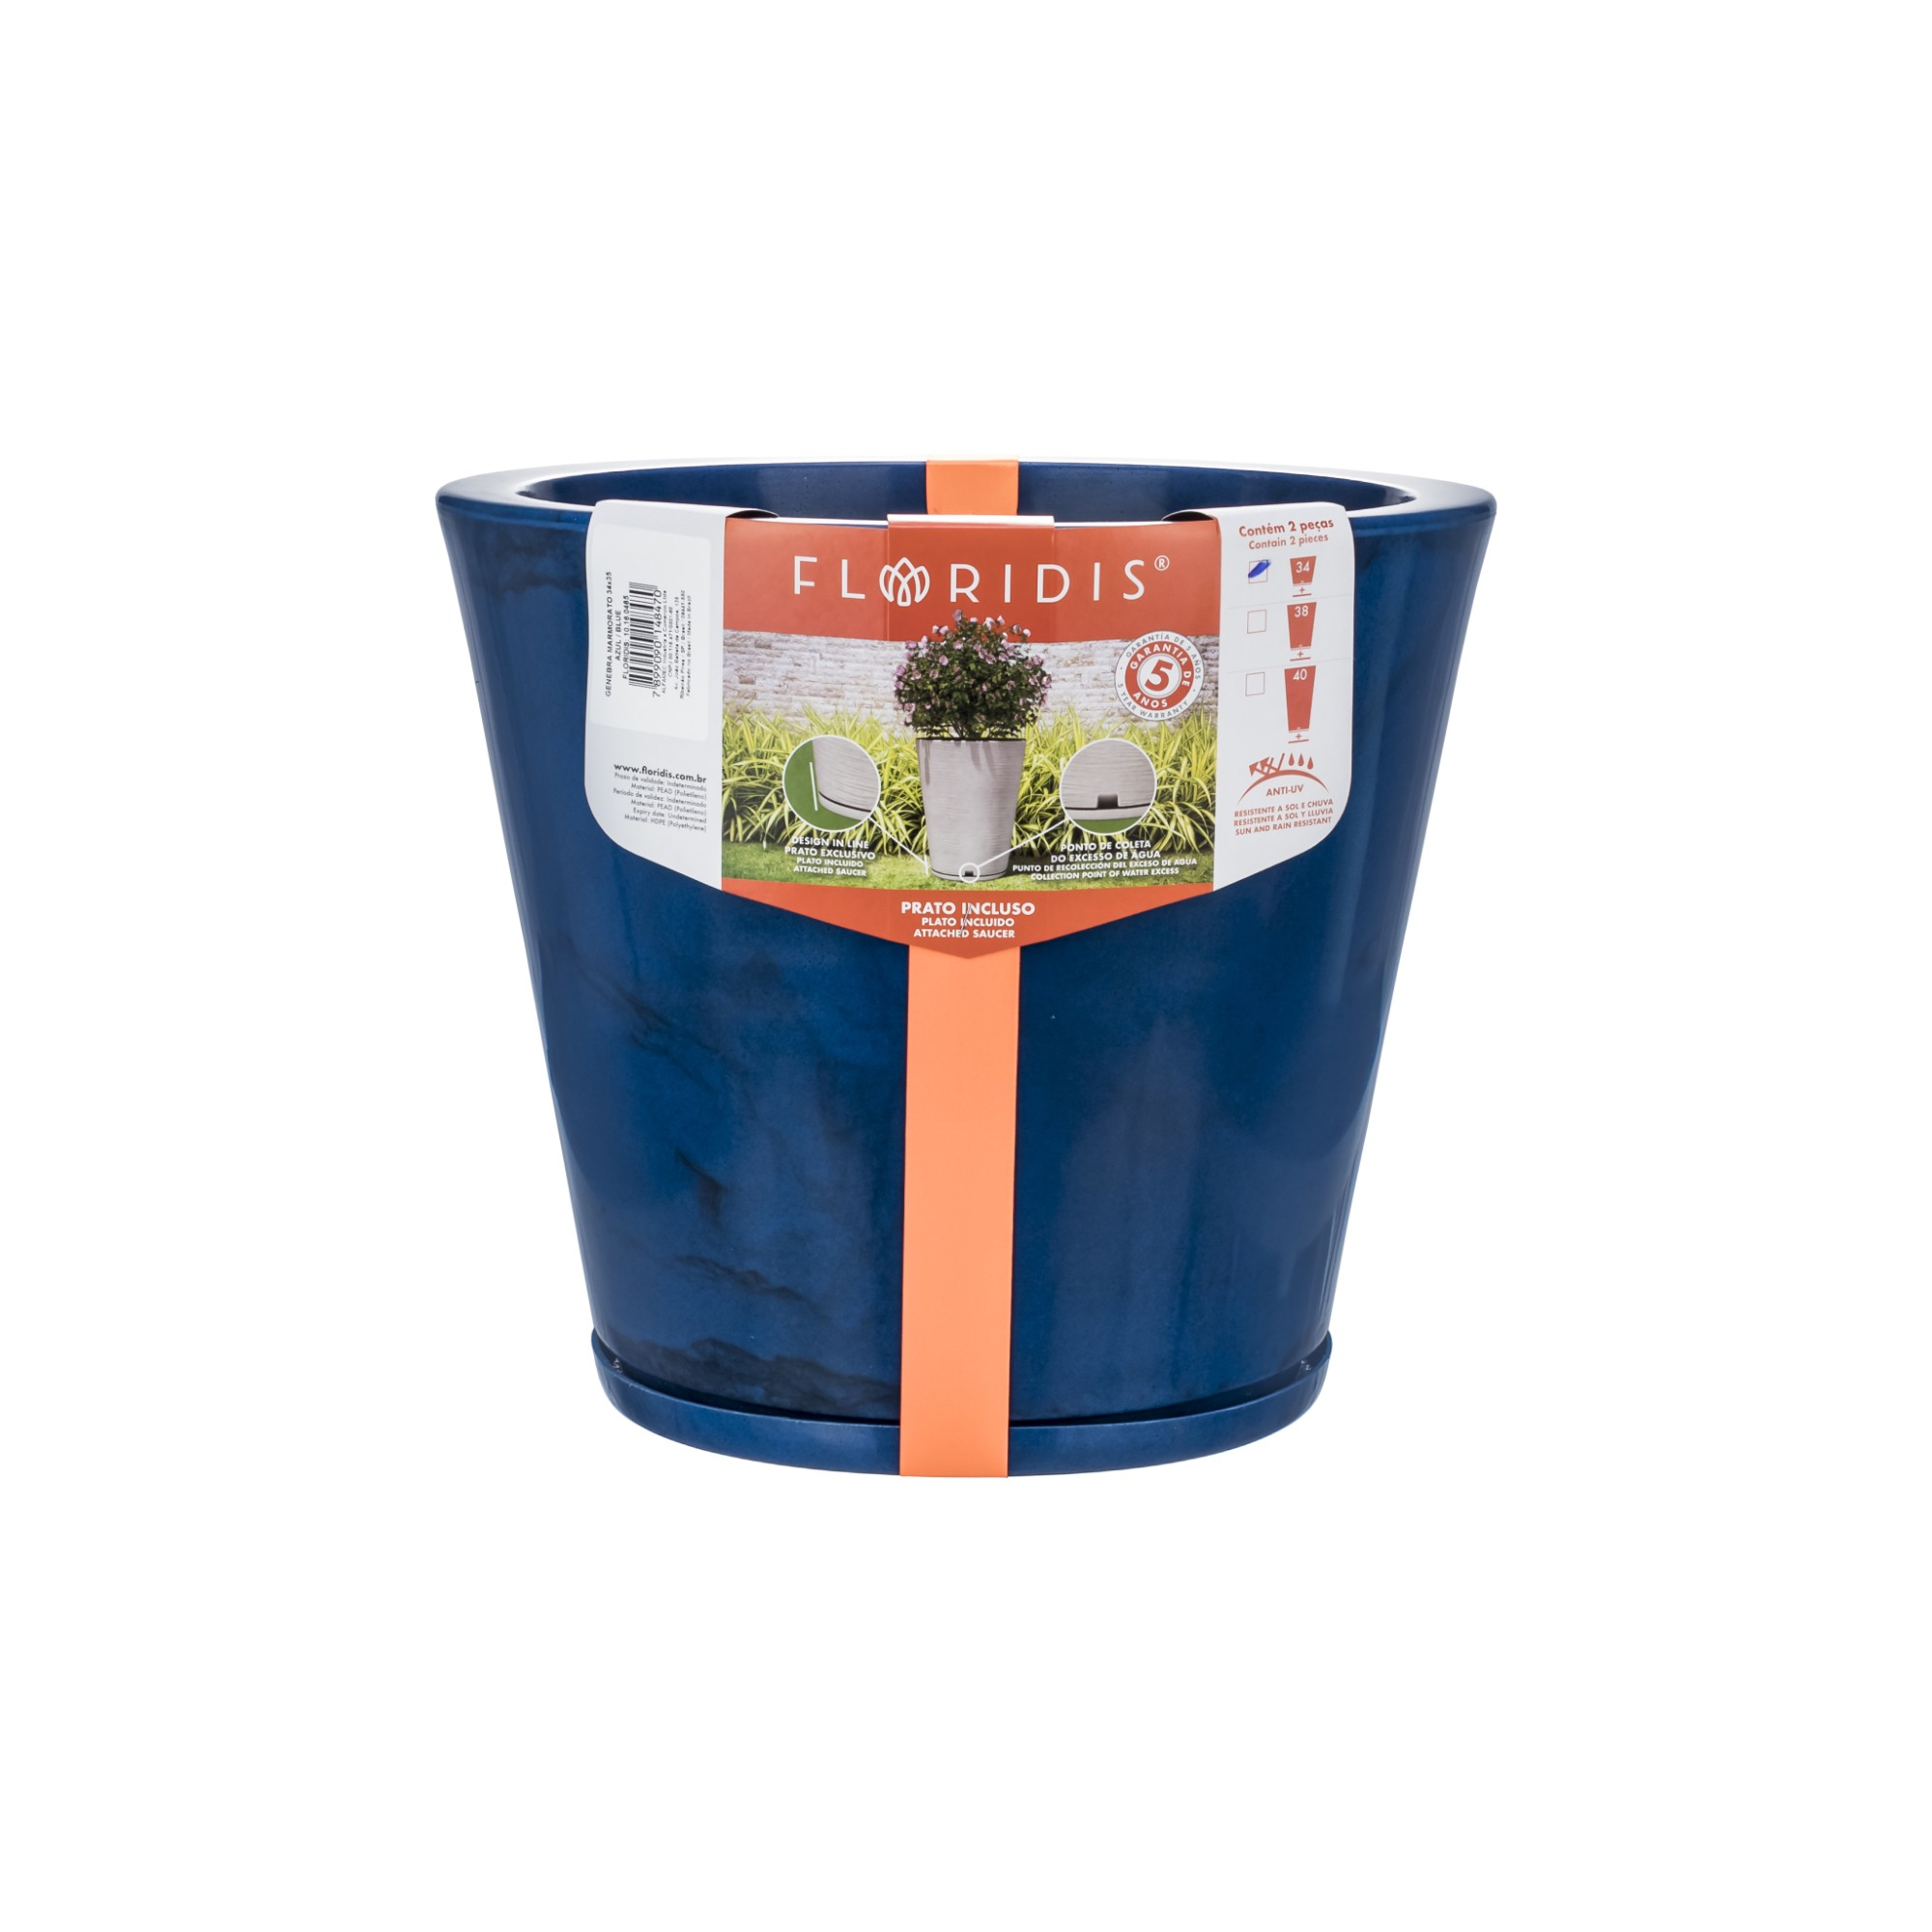 Vaso e Prato para Plantas Marmorato 35x40 cm Conico Azul escuro - Florids